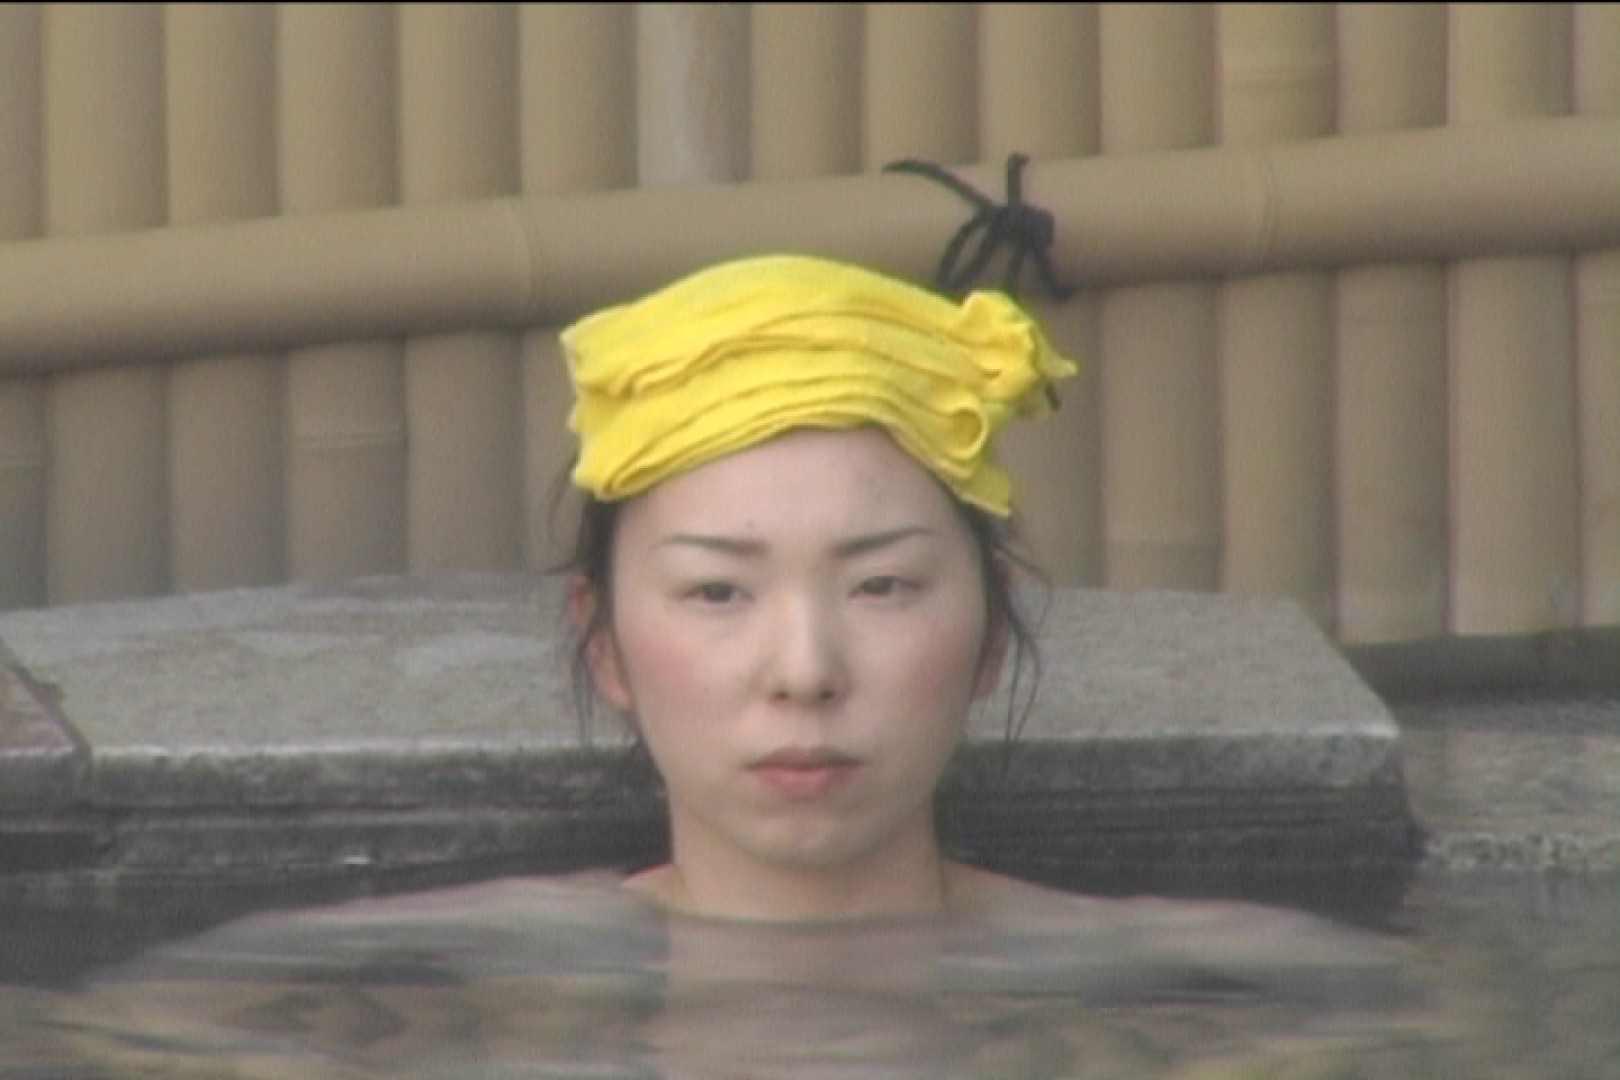 Aquaな露天風呂Vol.529 盗撮映像  51Pix 17